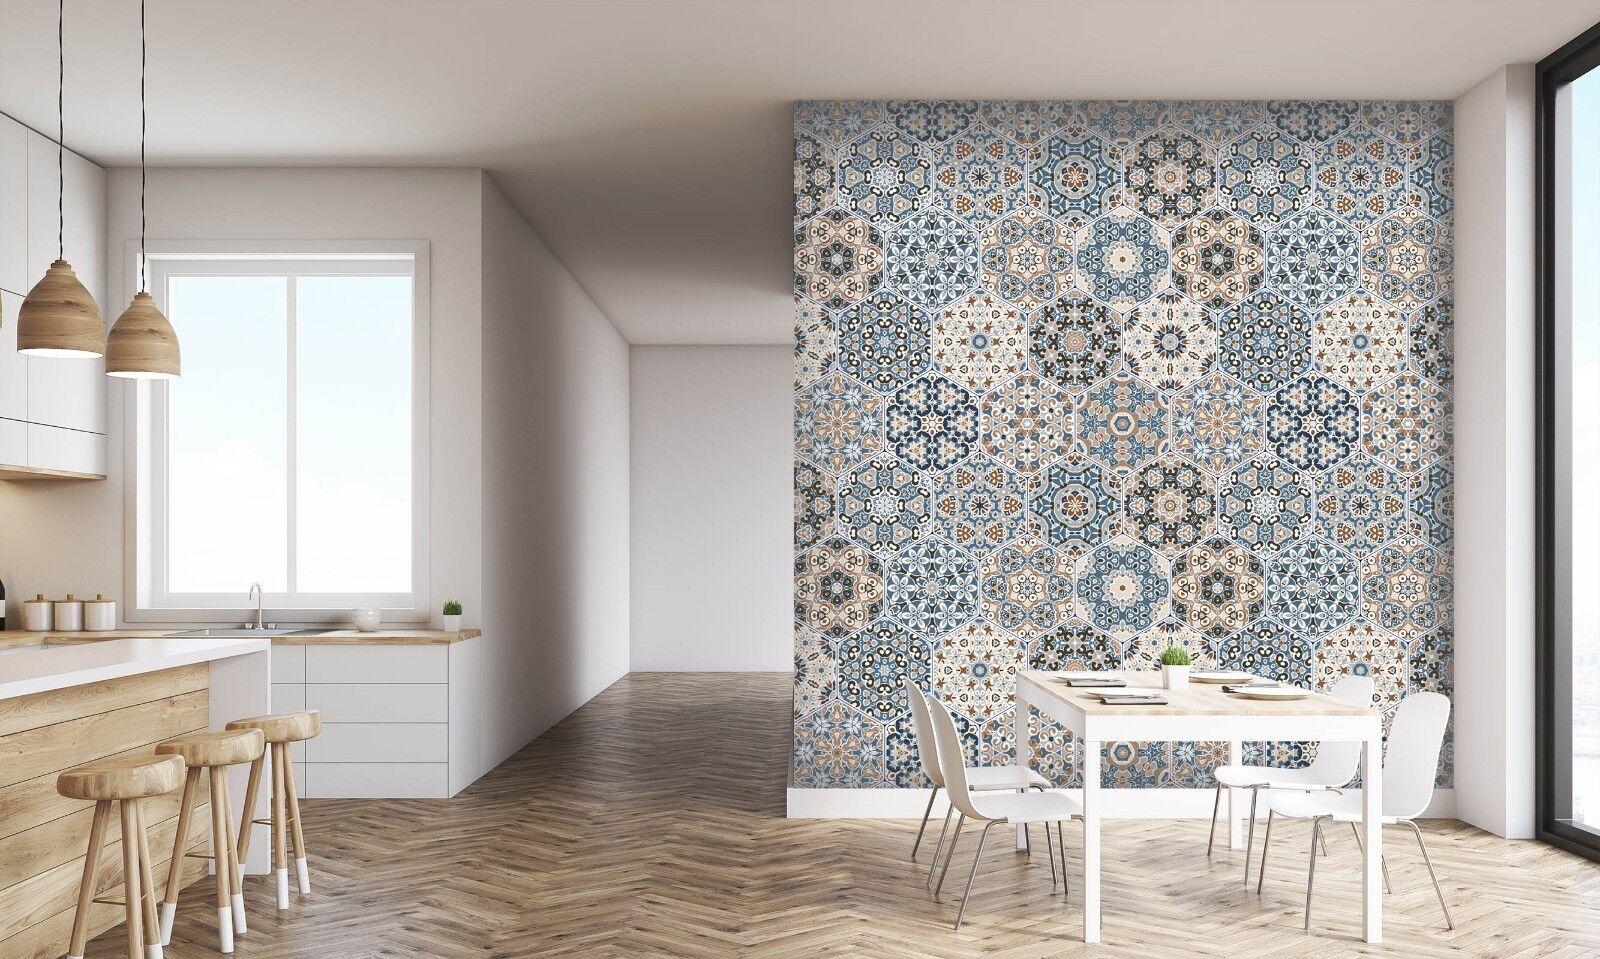 3D Art Floral Hexagon 2 Texture Tiles Marble Wall Paper Decal Wallpaper Mural AJ